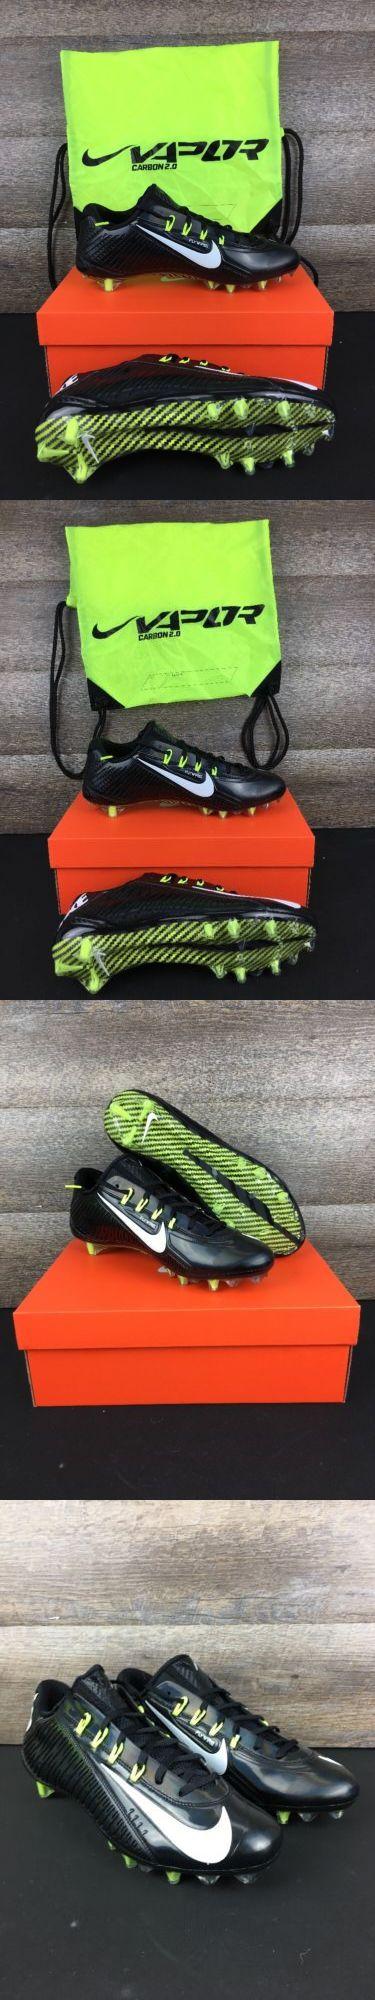 Men 159116: Nike Vapor Carbon Elite 2014 Td Football Cleats Black 631425-011 Men S Size 10.5 -> BUY IT NOW ONLY: $79.99 on eBay!